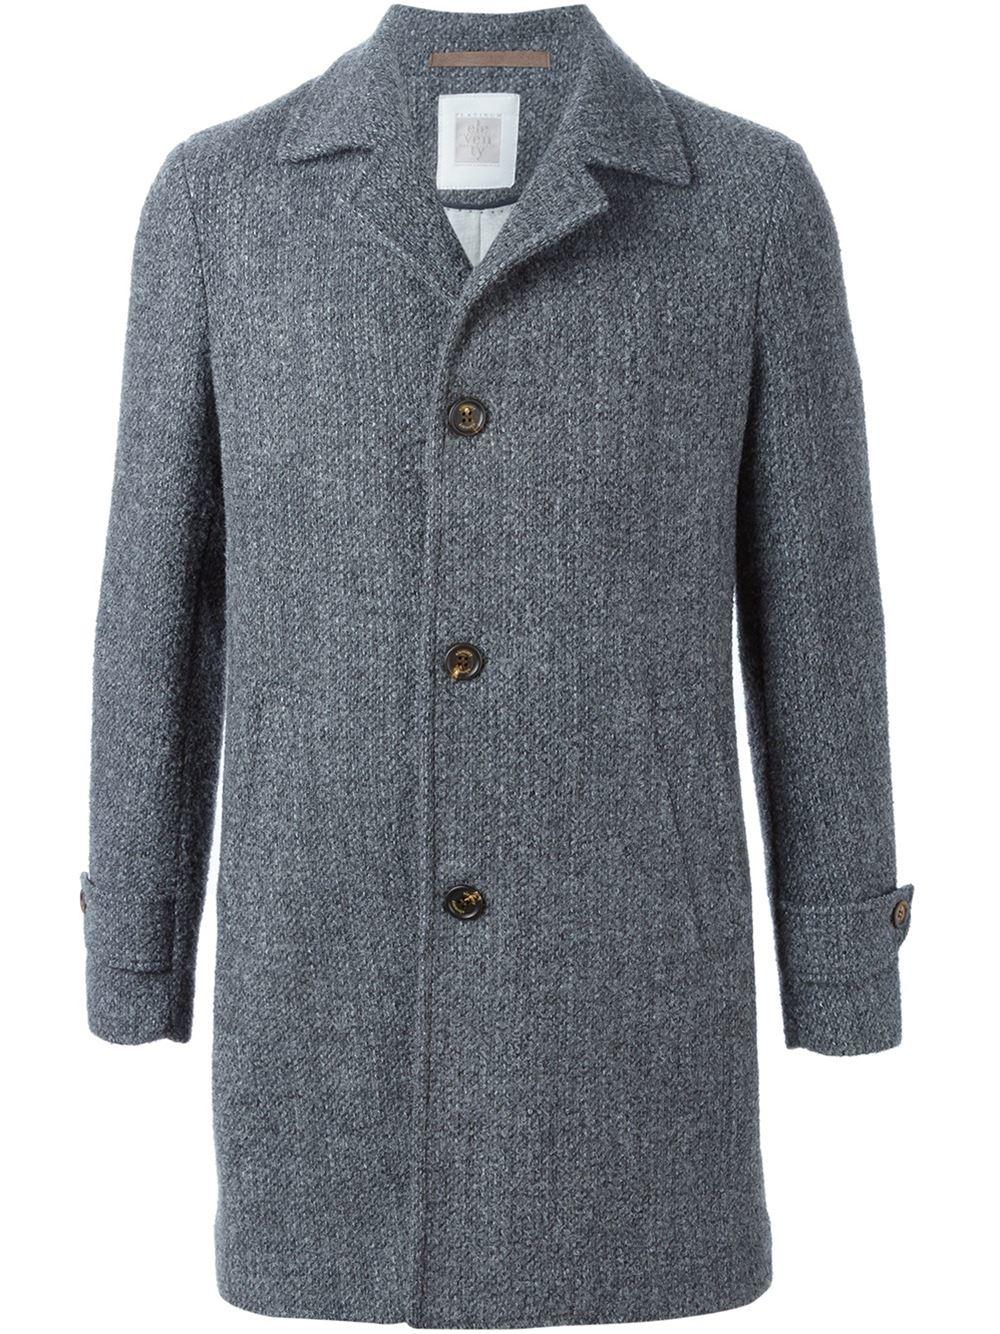 Gray overcoat